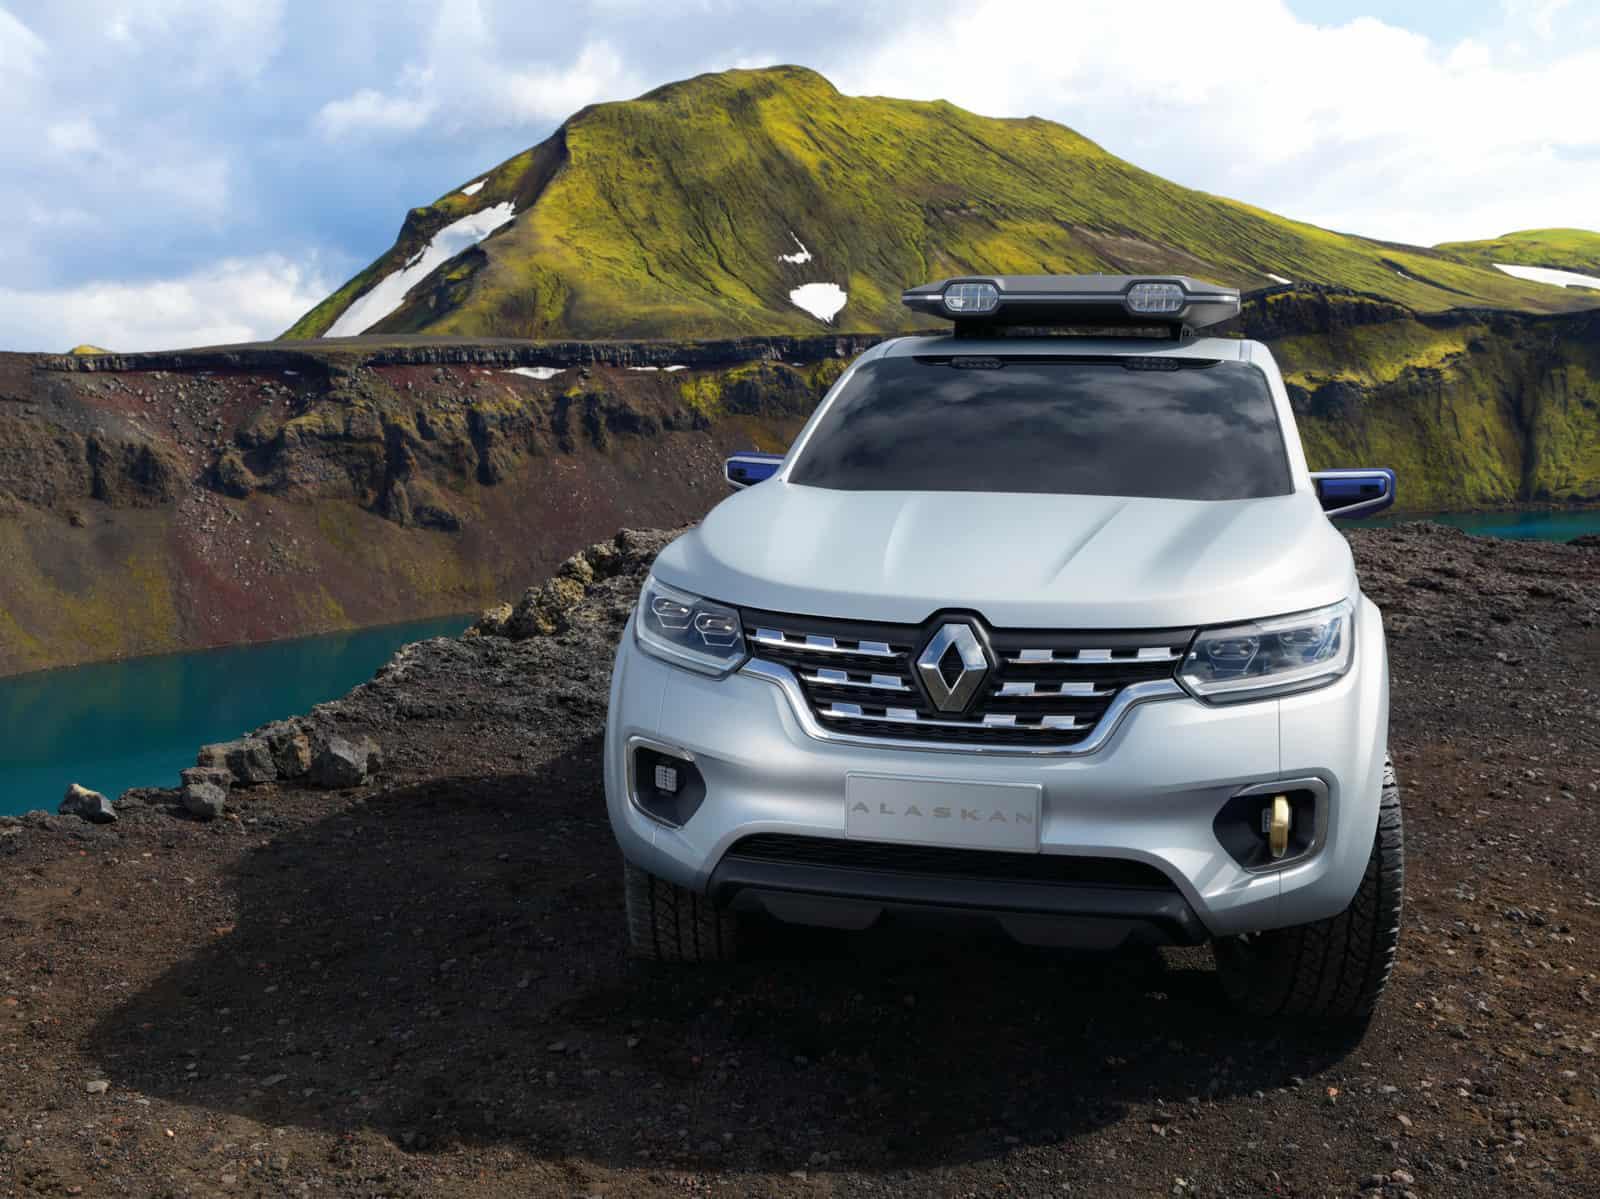 Renault-Alaskan-Concept-19